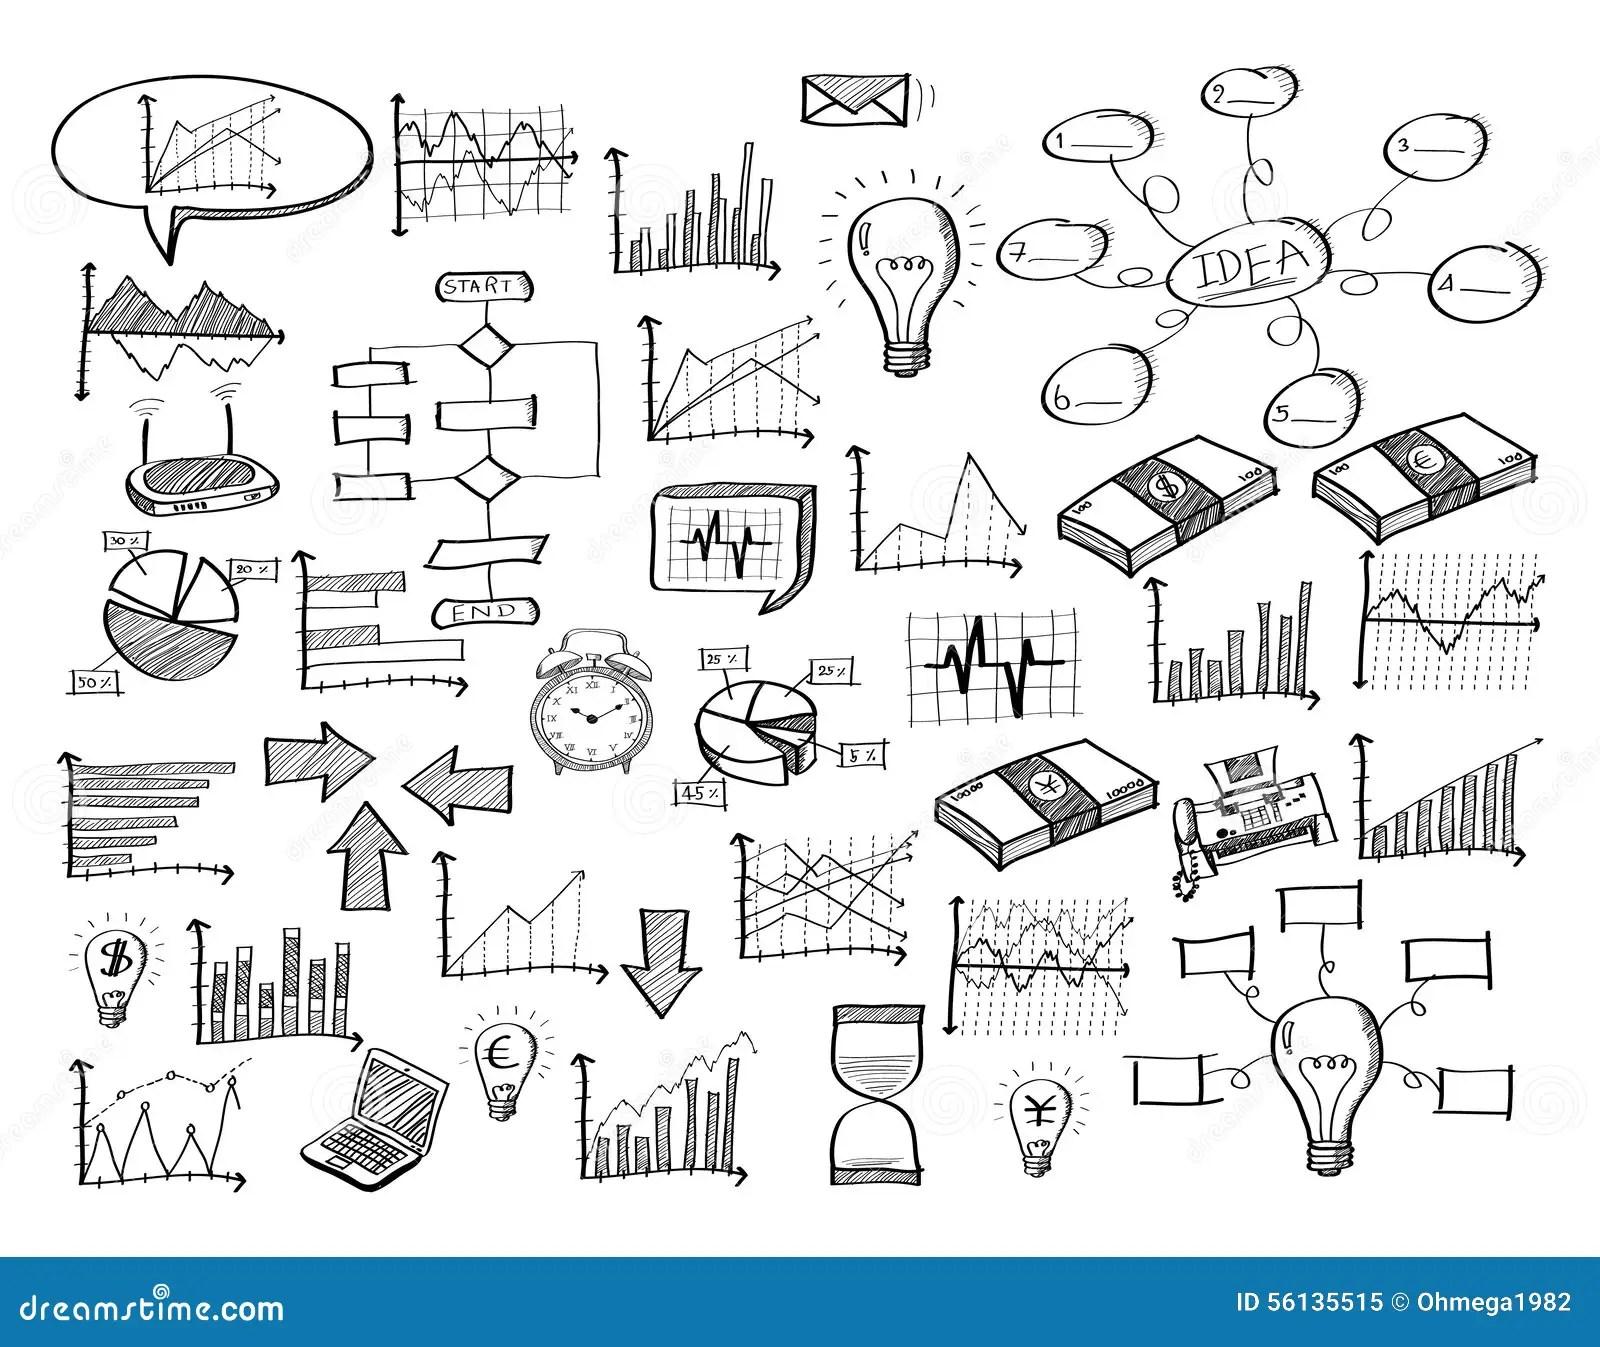 Illustration Diagram